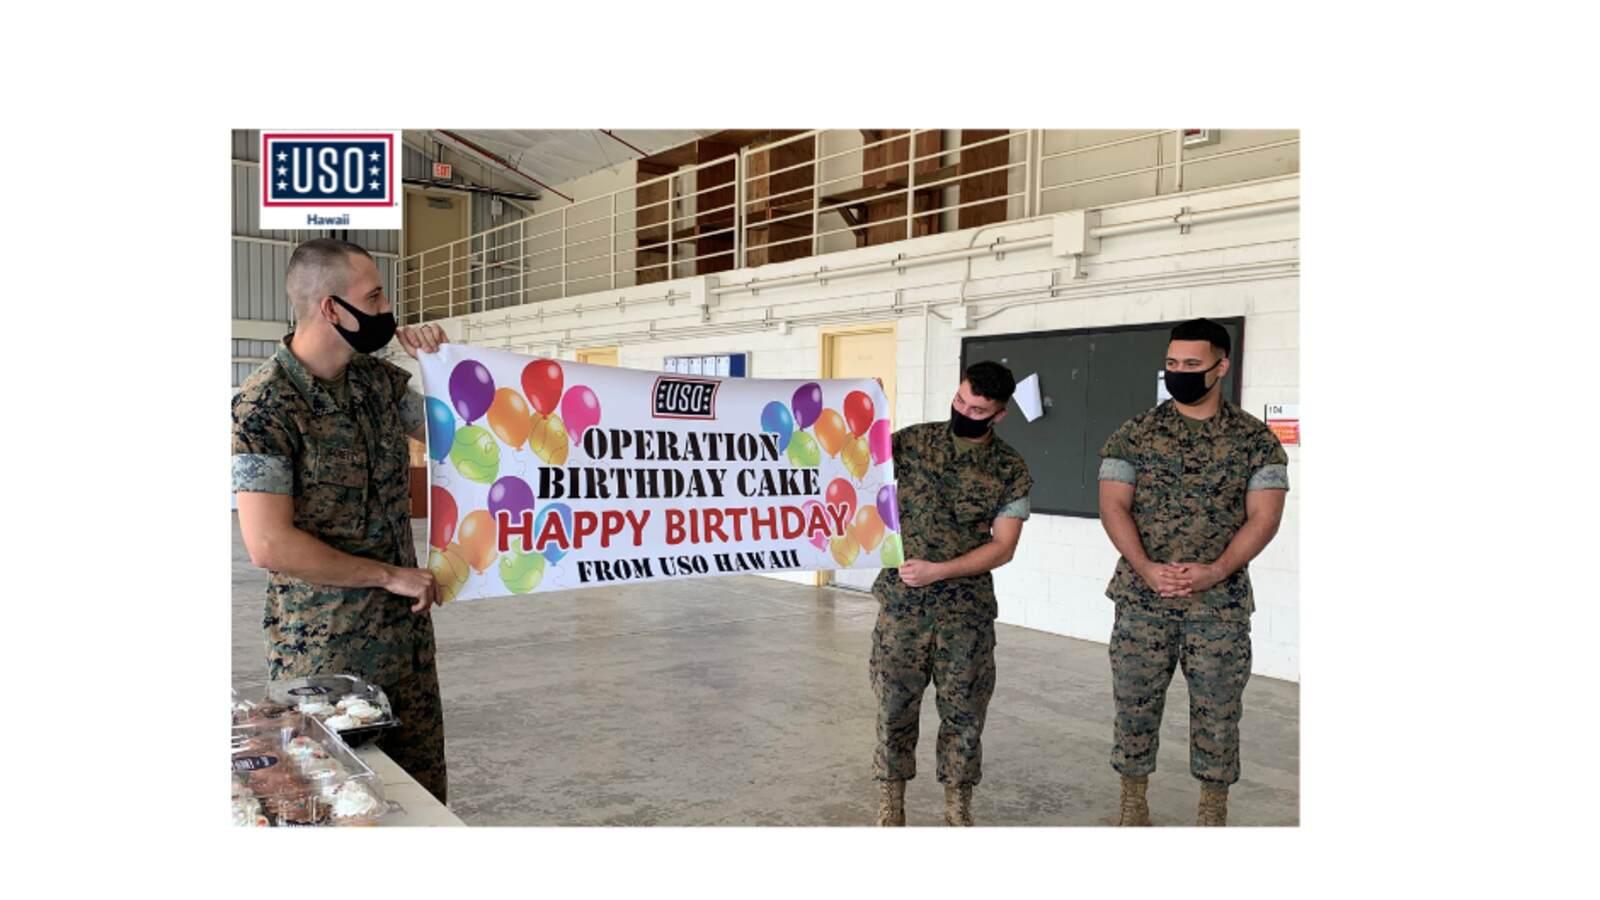 Uso Operation Birthday Cake